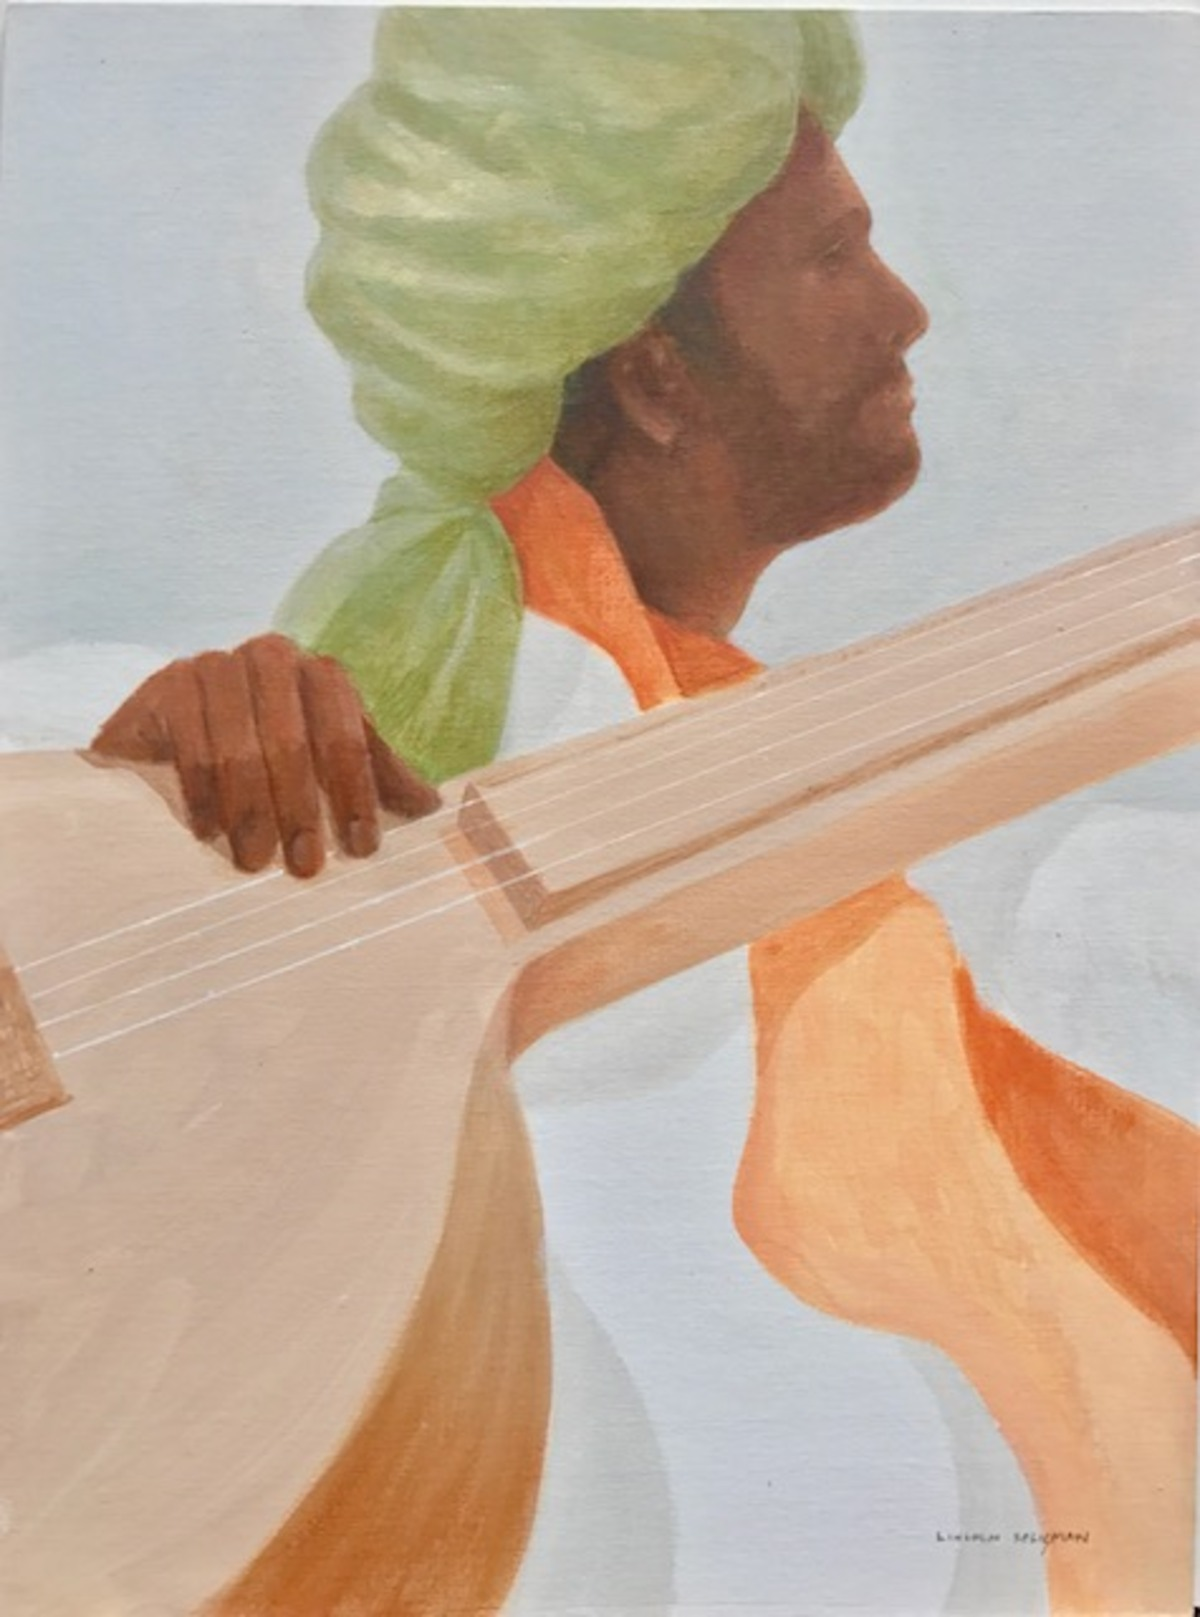 Sitar player, olive turban